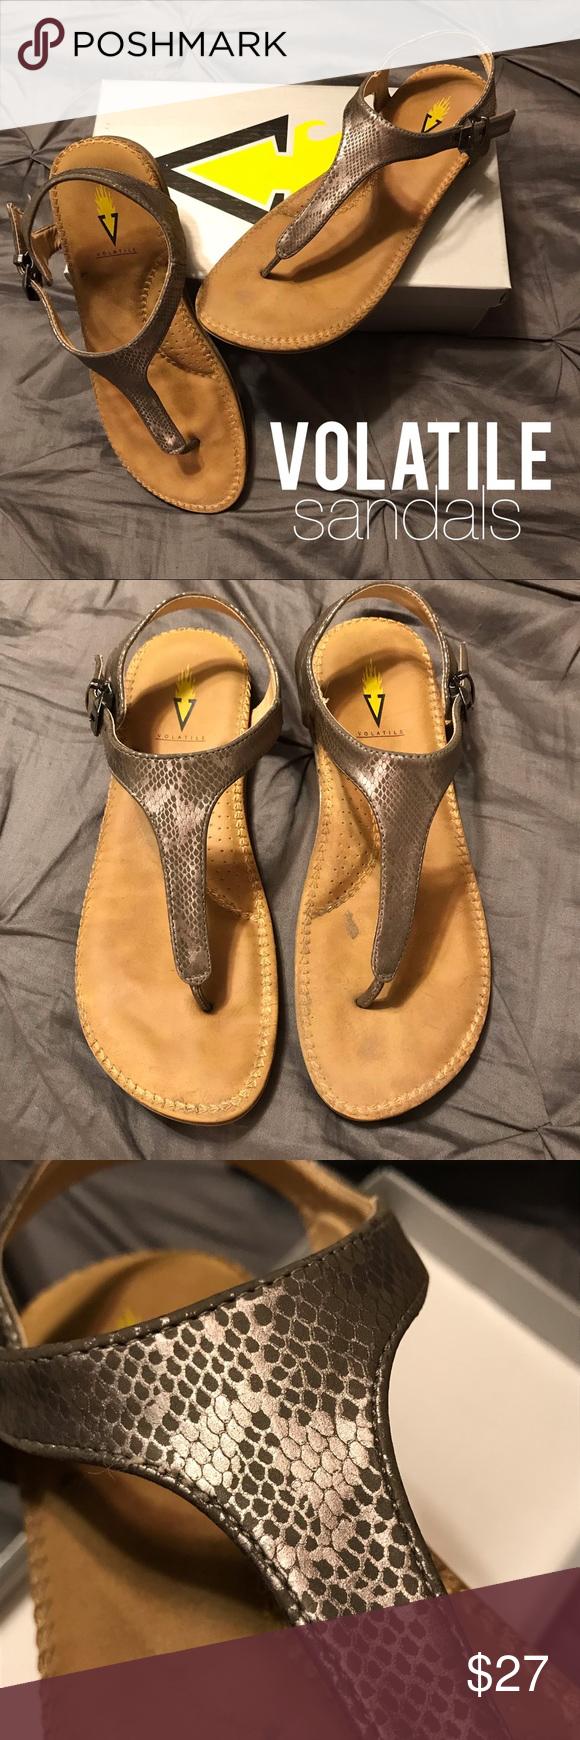 Volatile Reese Pewter Snakeskin Sandals Size 9 Volatile Reece Pewter